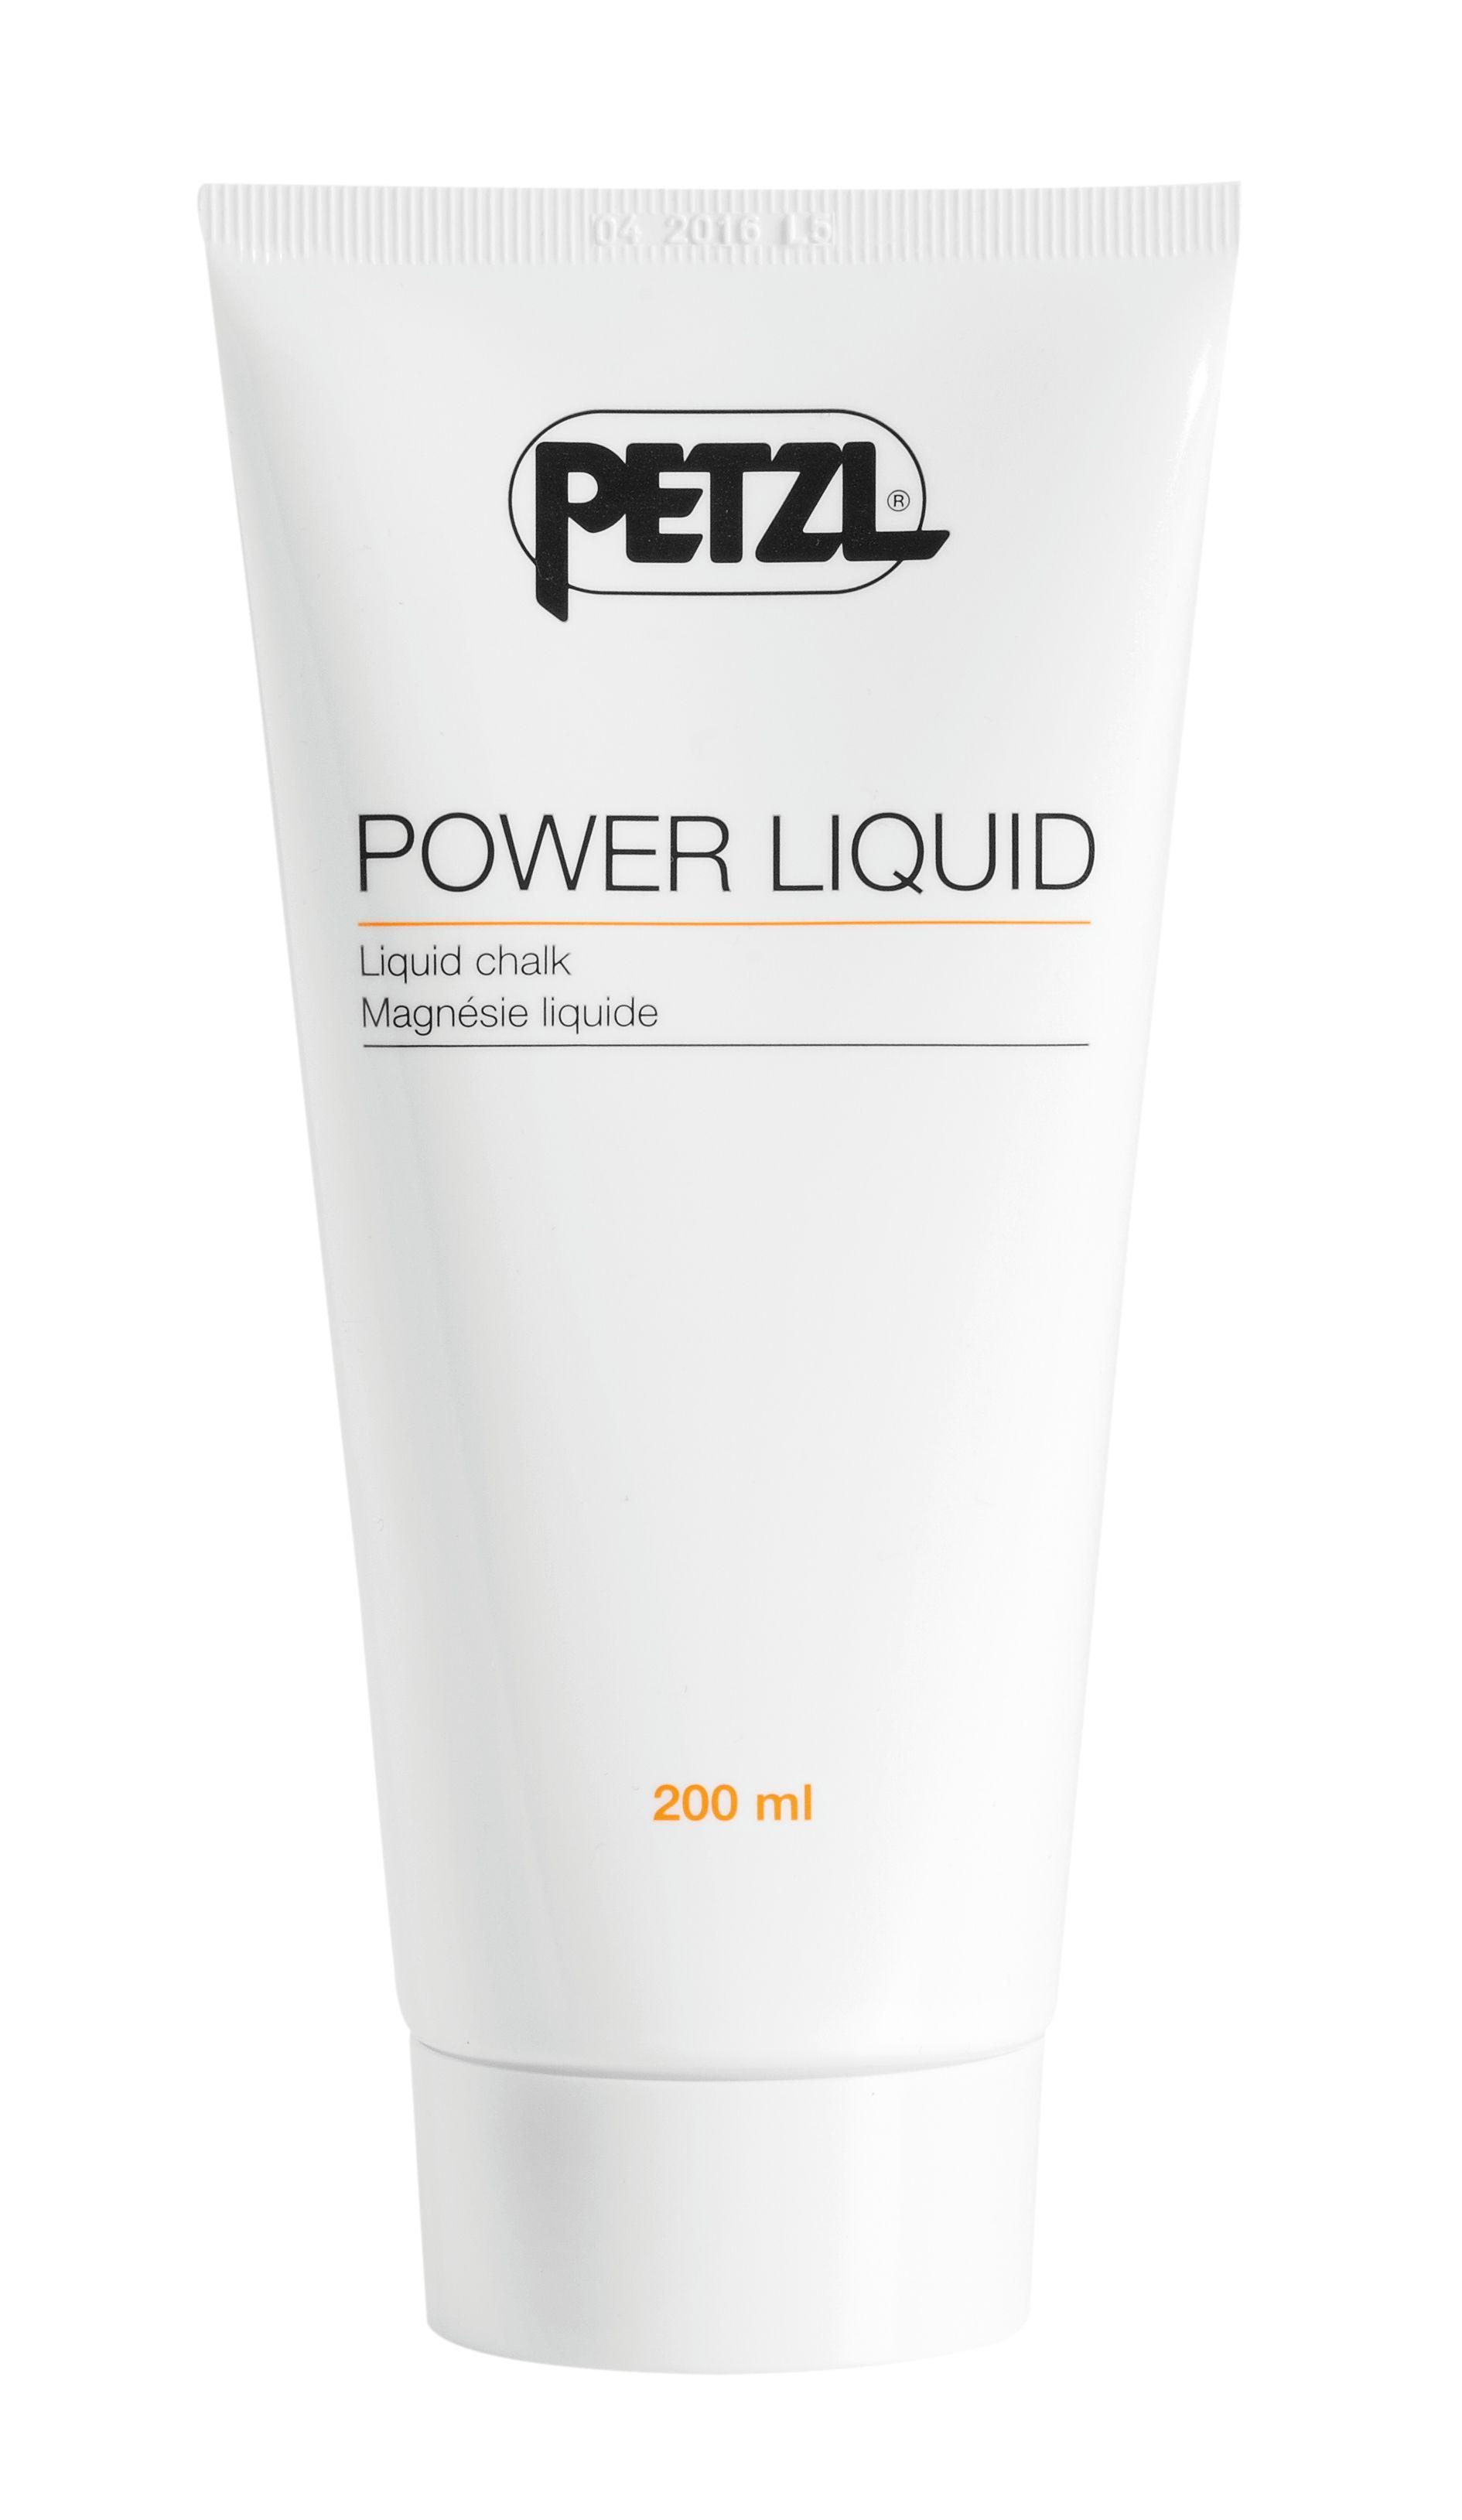 Petzl - Power Liquid 200 mL - Bolsa de magnesio